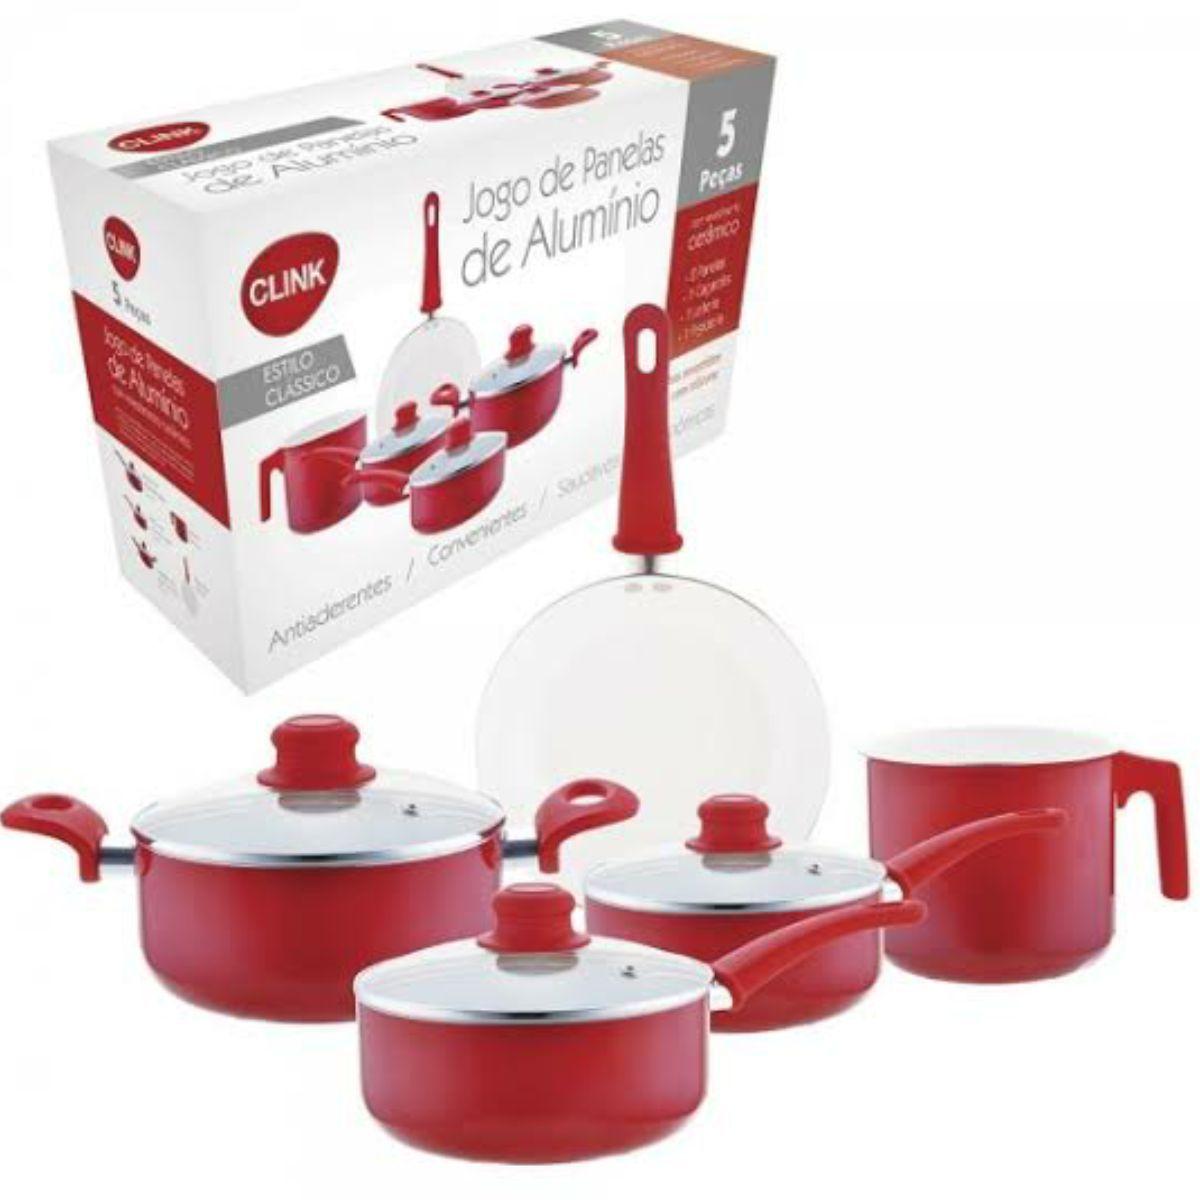 Jogo De Panela Aluminio C/ Revestimento Ceramico Kit 5pcs